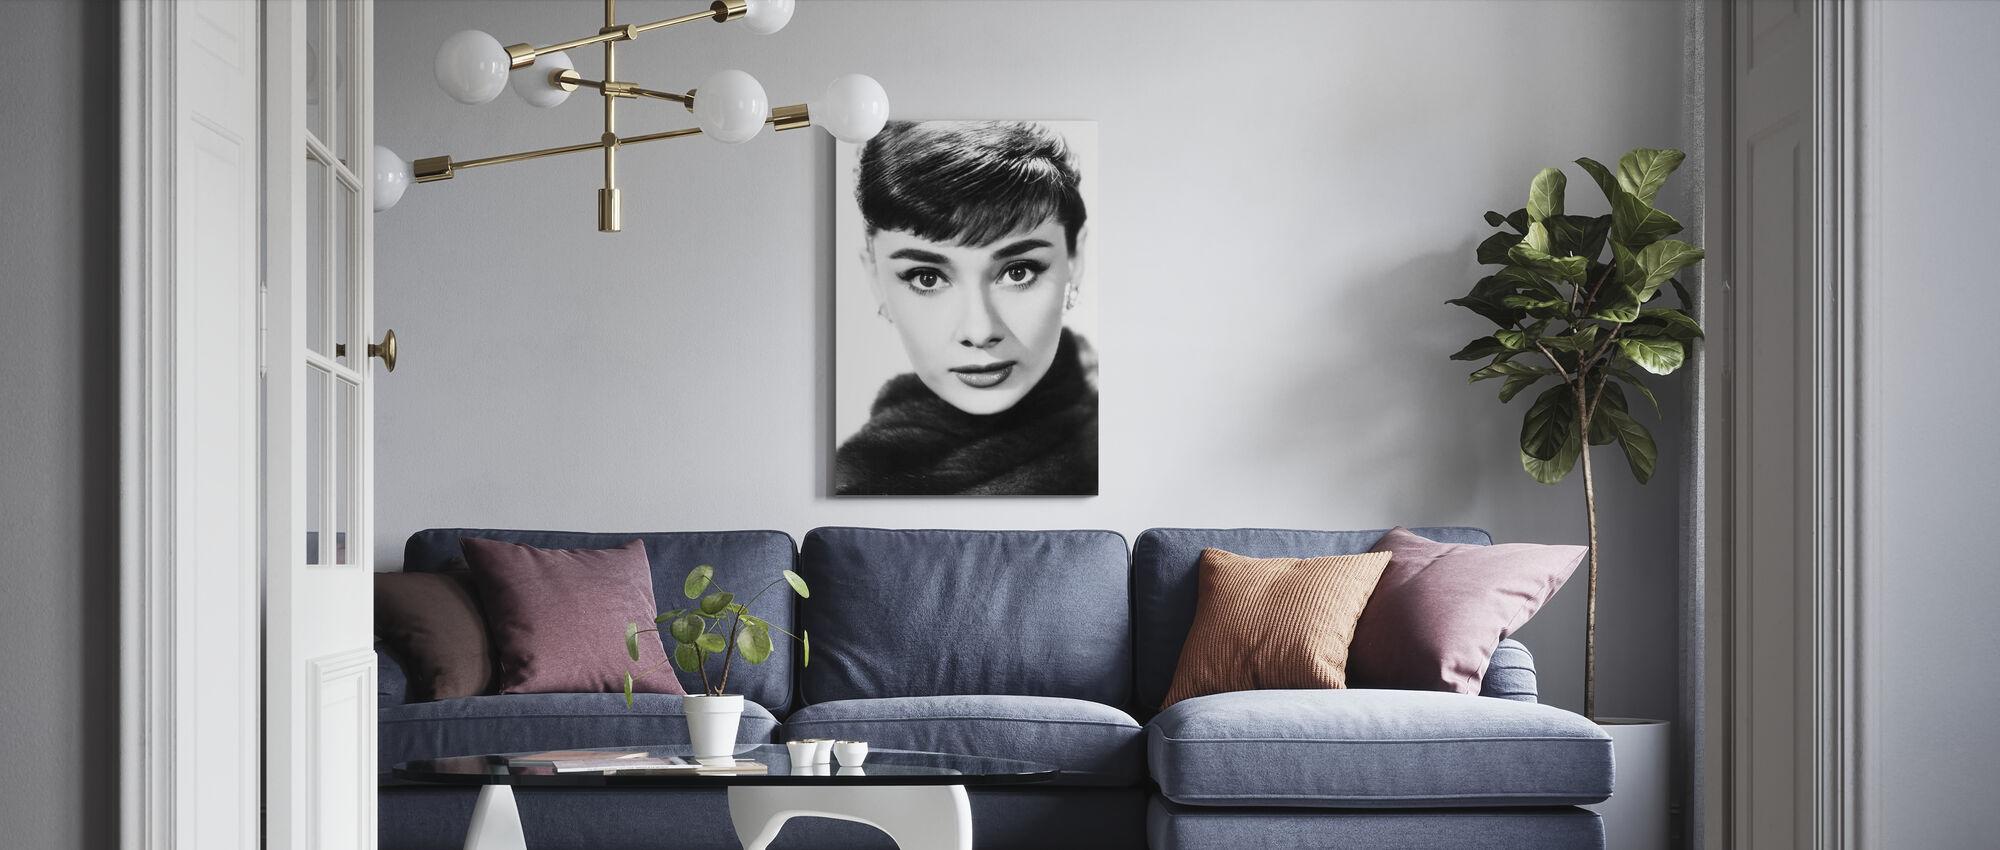 Sabrina - Canvastavla - Vardagsrum